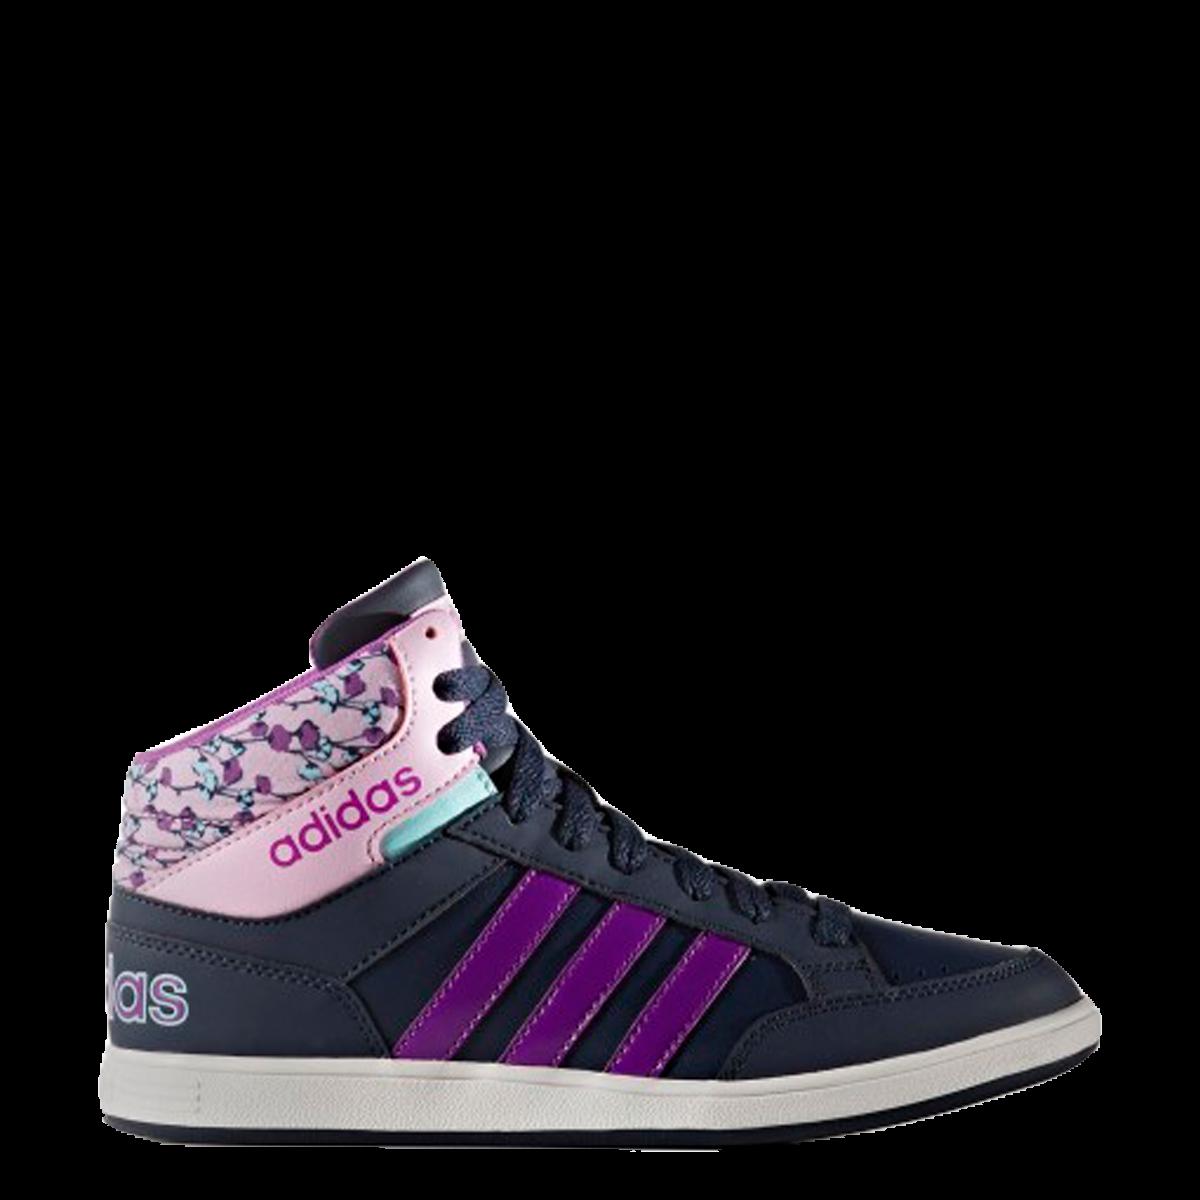 0b0e531aee8 Bizz Store - Tênis Infantil Menina Adidas Hoops Mid Cano Médio